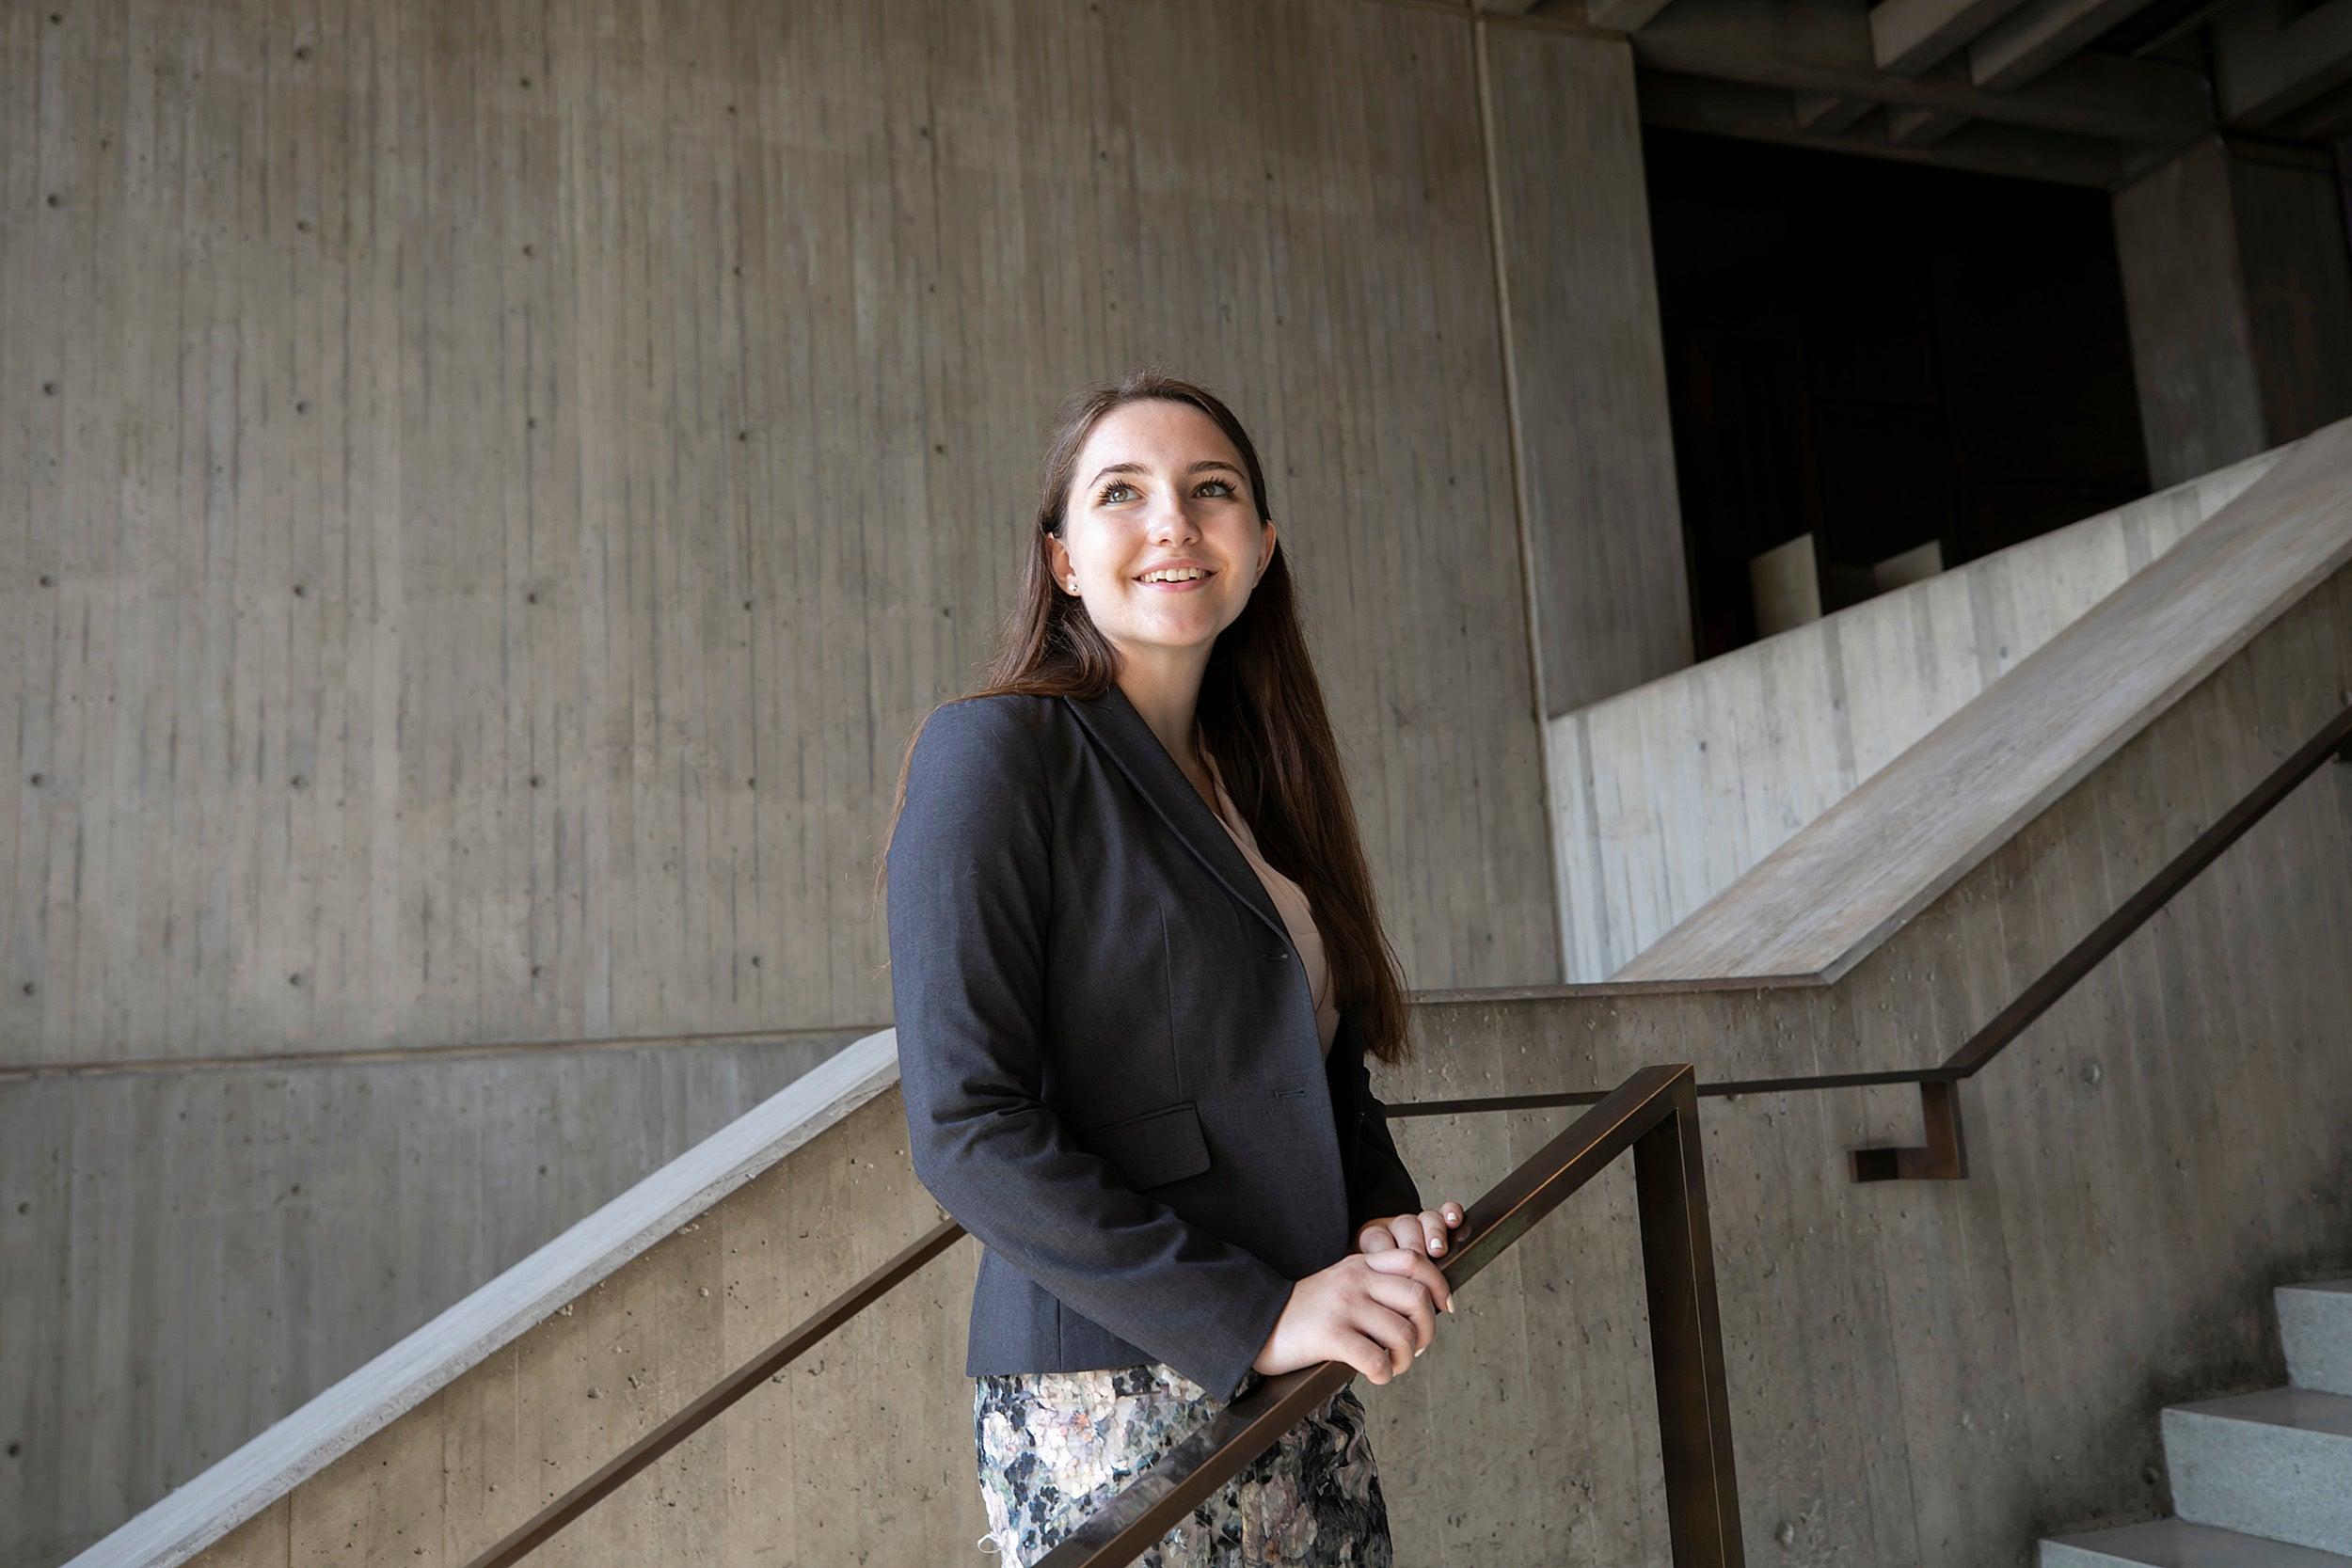 Harvard University graduate, Lexi Smith, '18 is the third Harvard Presidential City of Boston Fellow. She works in Boston at City Hall.